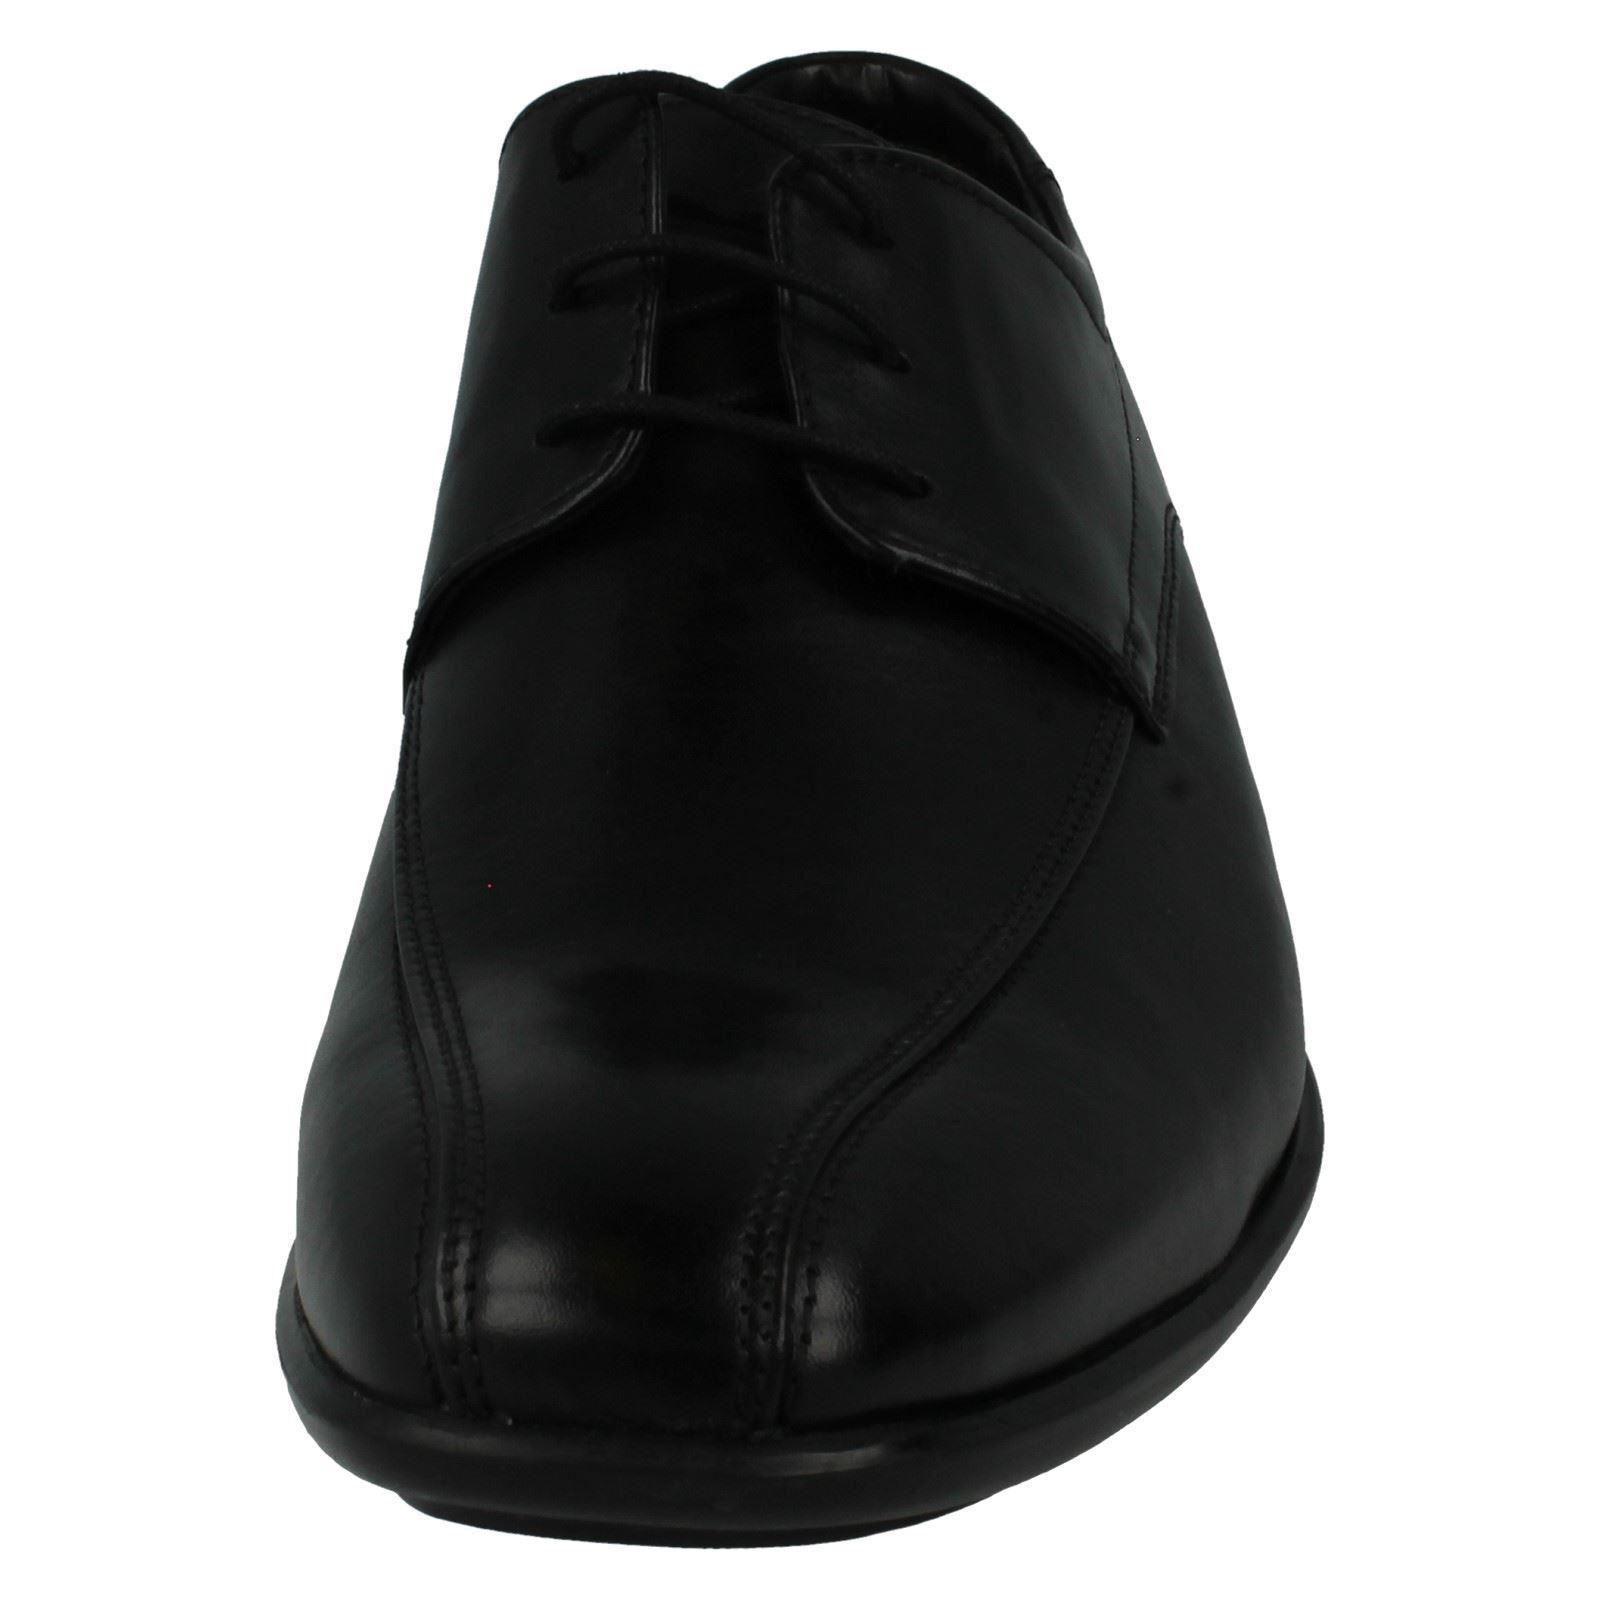 Herren schwarze CLARKS schwarze Herren Lederschuhe - gadwell über 4698e4